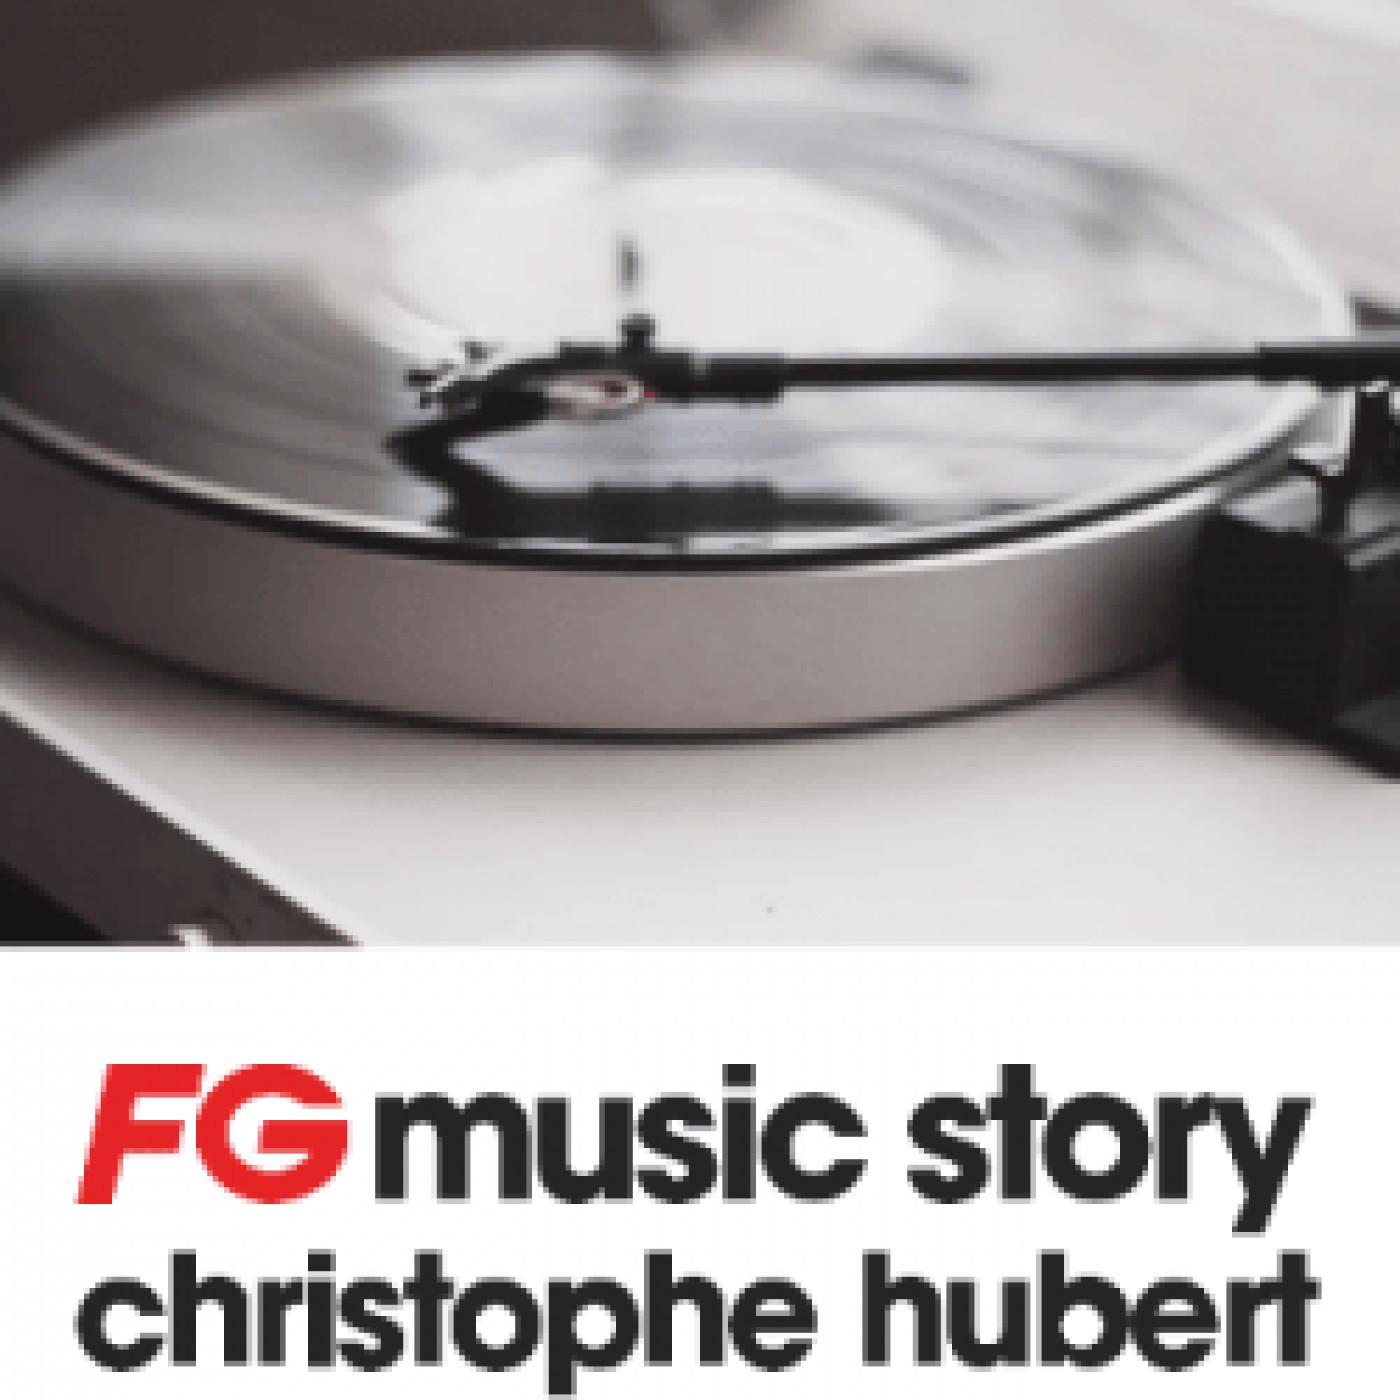 FG MUSIC STORY : KYGO